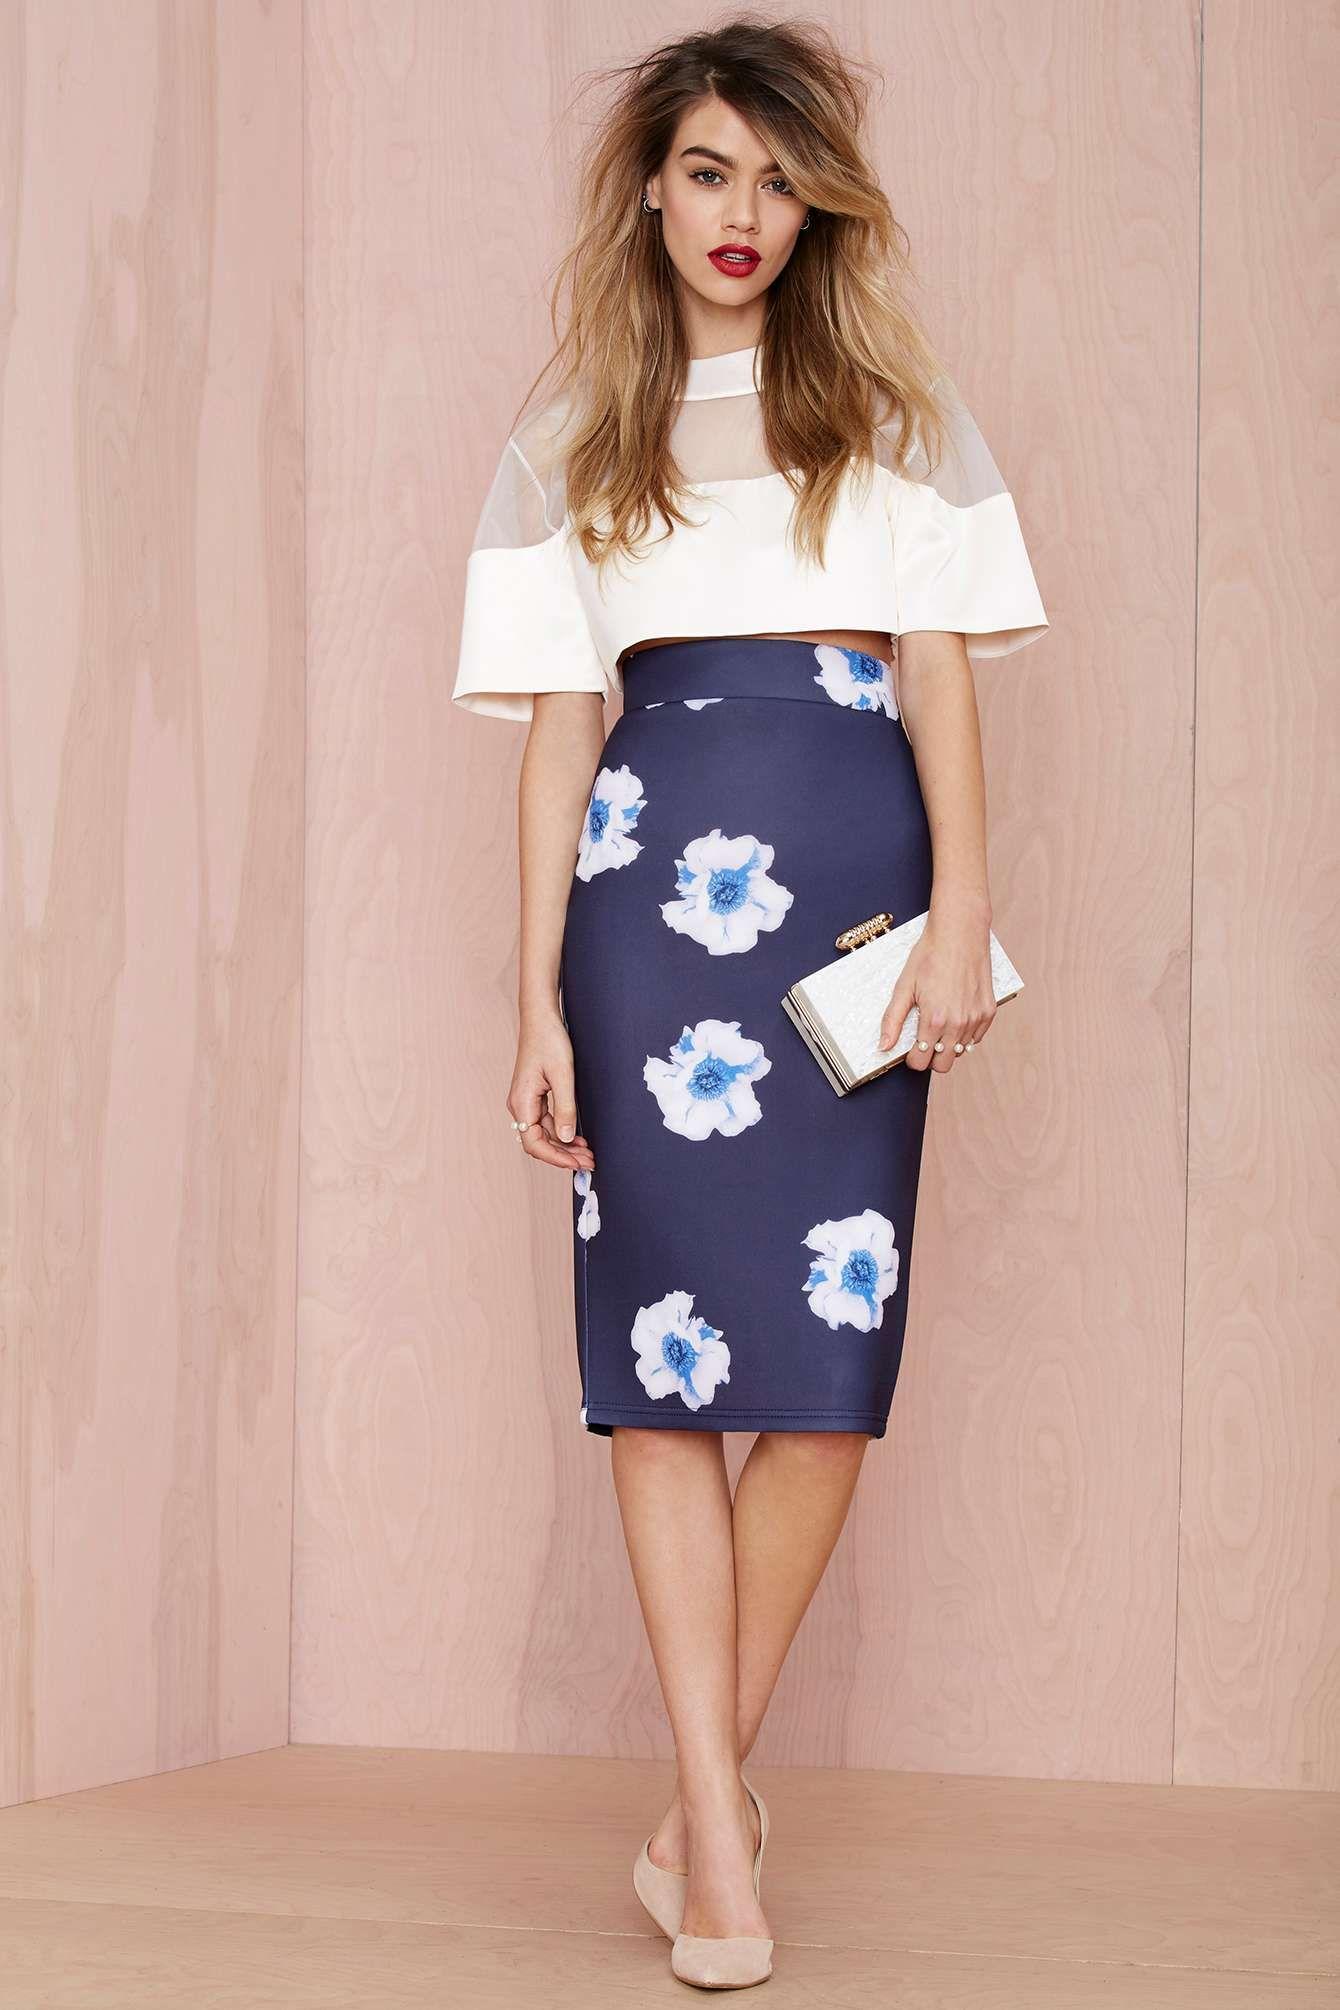 Instant Karma Neoprene Midi Skirt | Shop Clothes at Nasty Gal ...